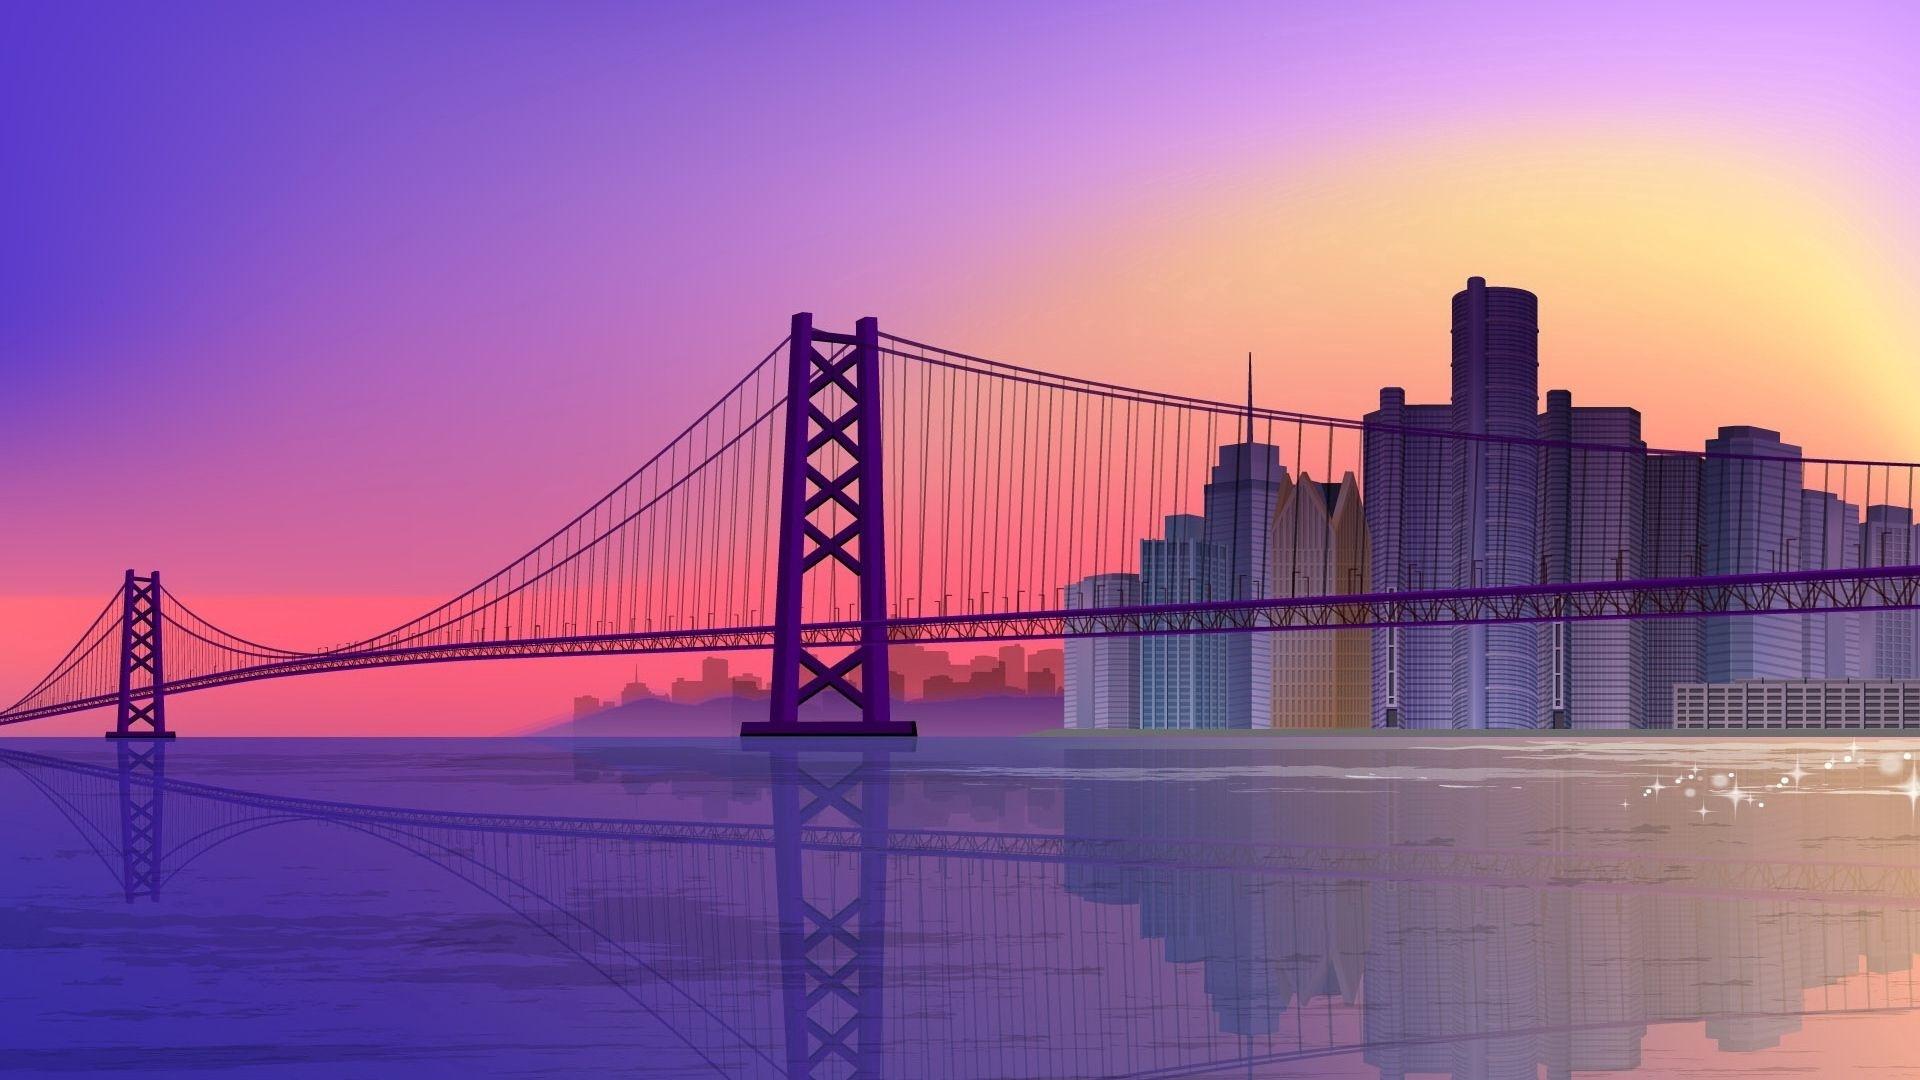 Bridge Art Image